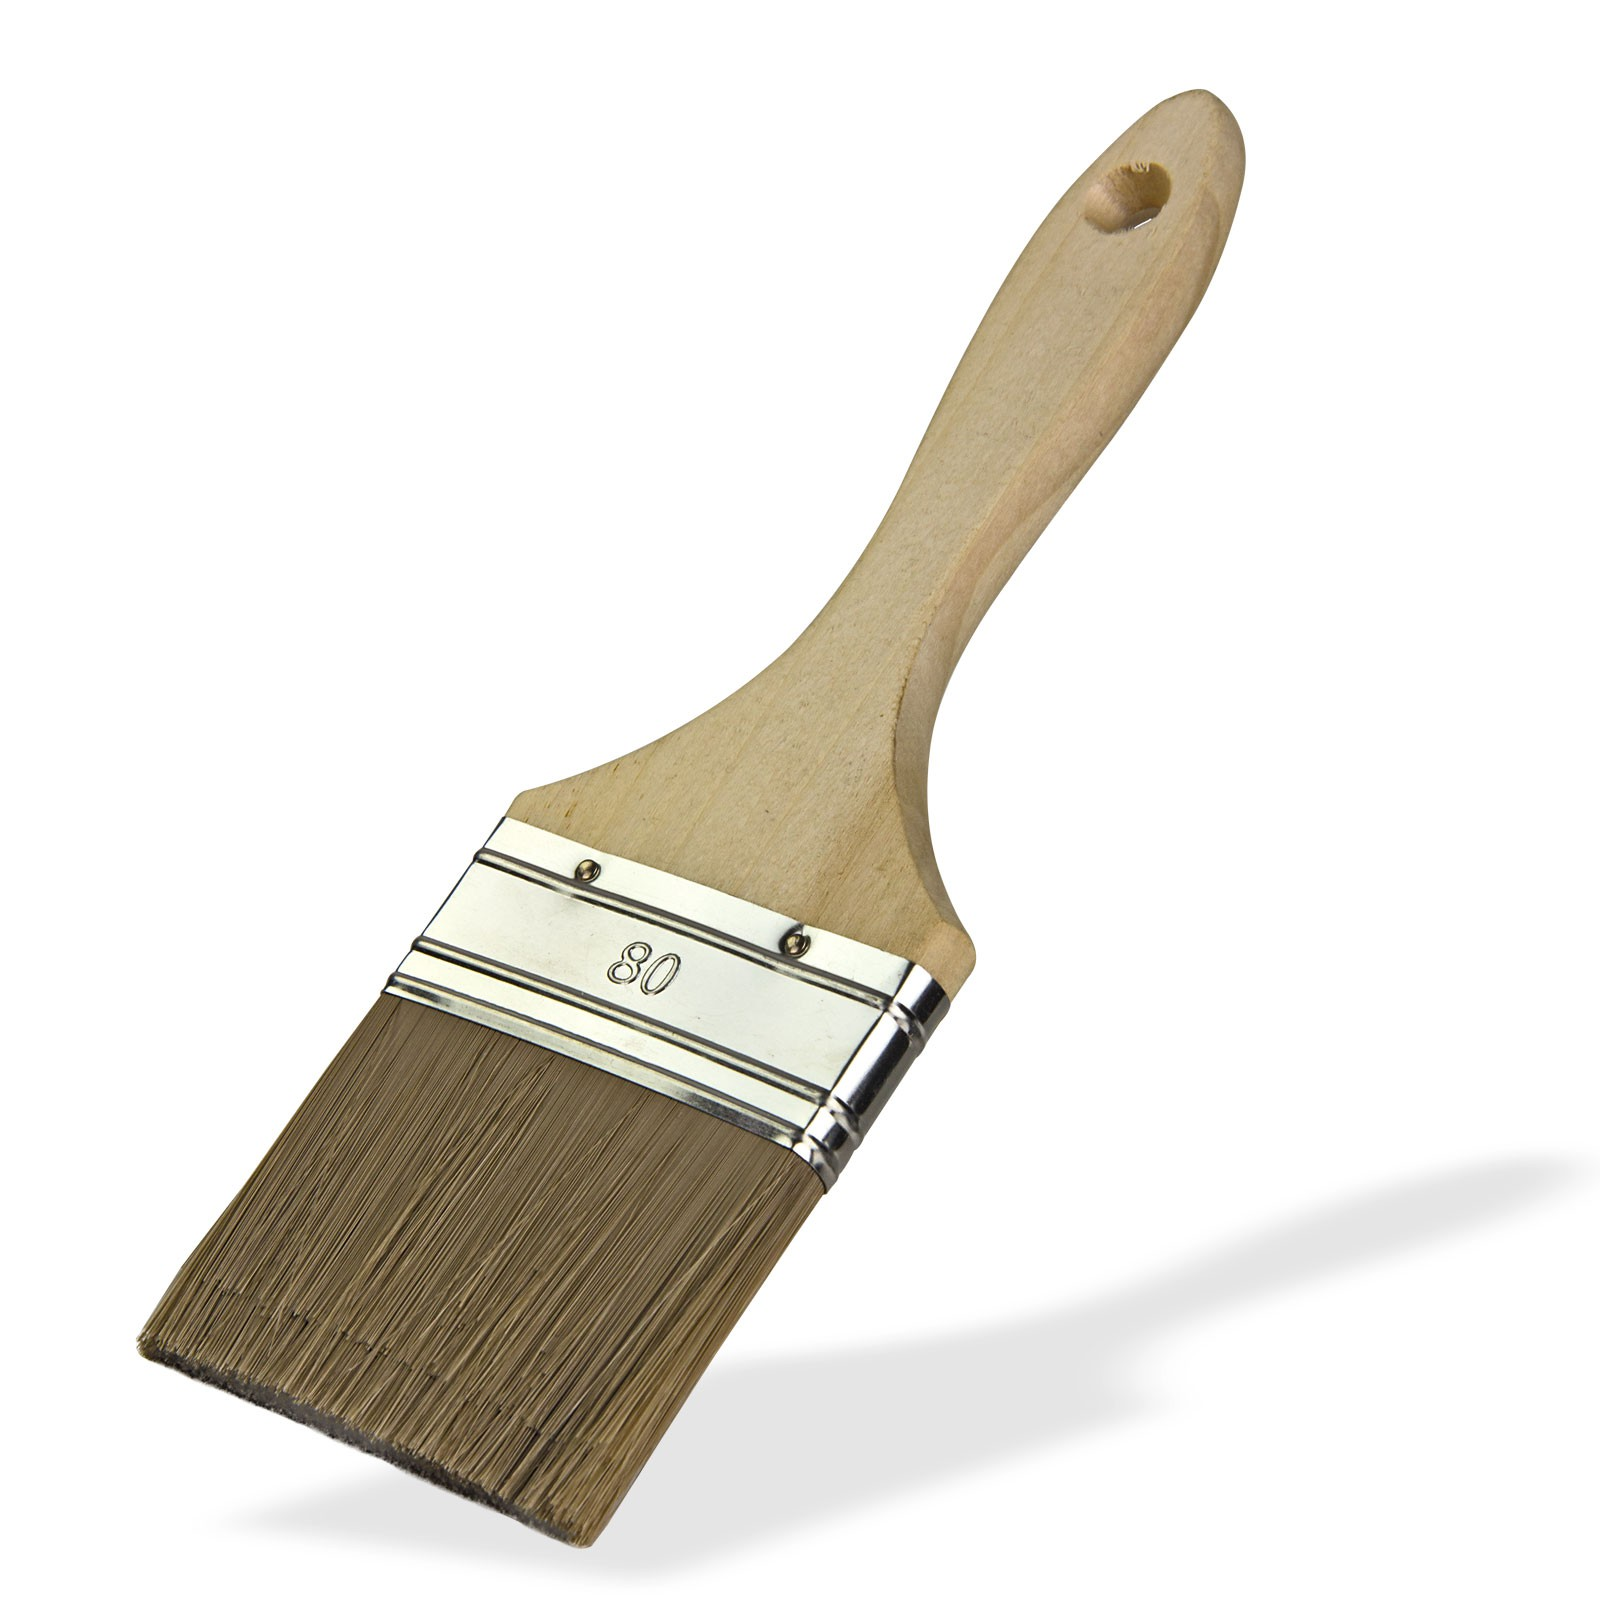 Dema Lasurpinsel Malerpinsel Pinsel Flachpinsel 80mm Lackpinsel Malerbedarf 15327